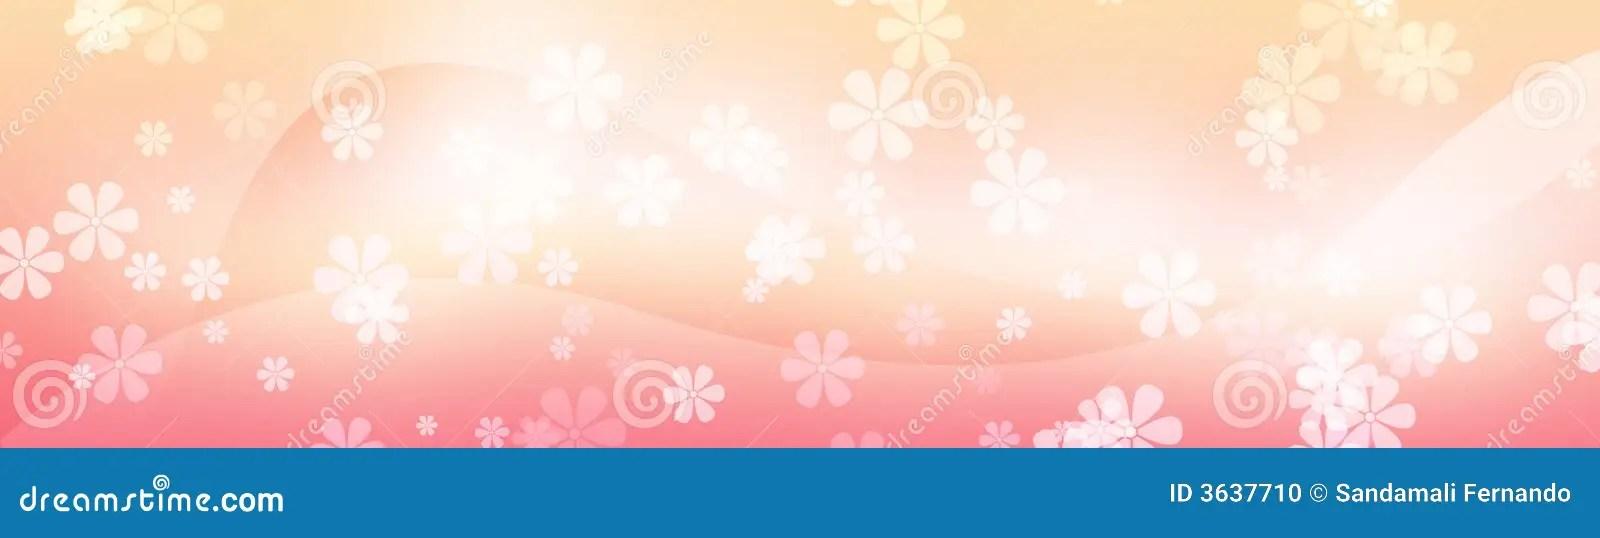 Cute Header Wallpaper Floral Web Header Flower Background Stock Photo Image